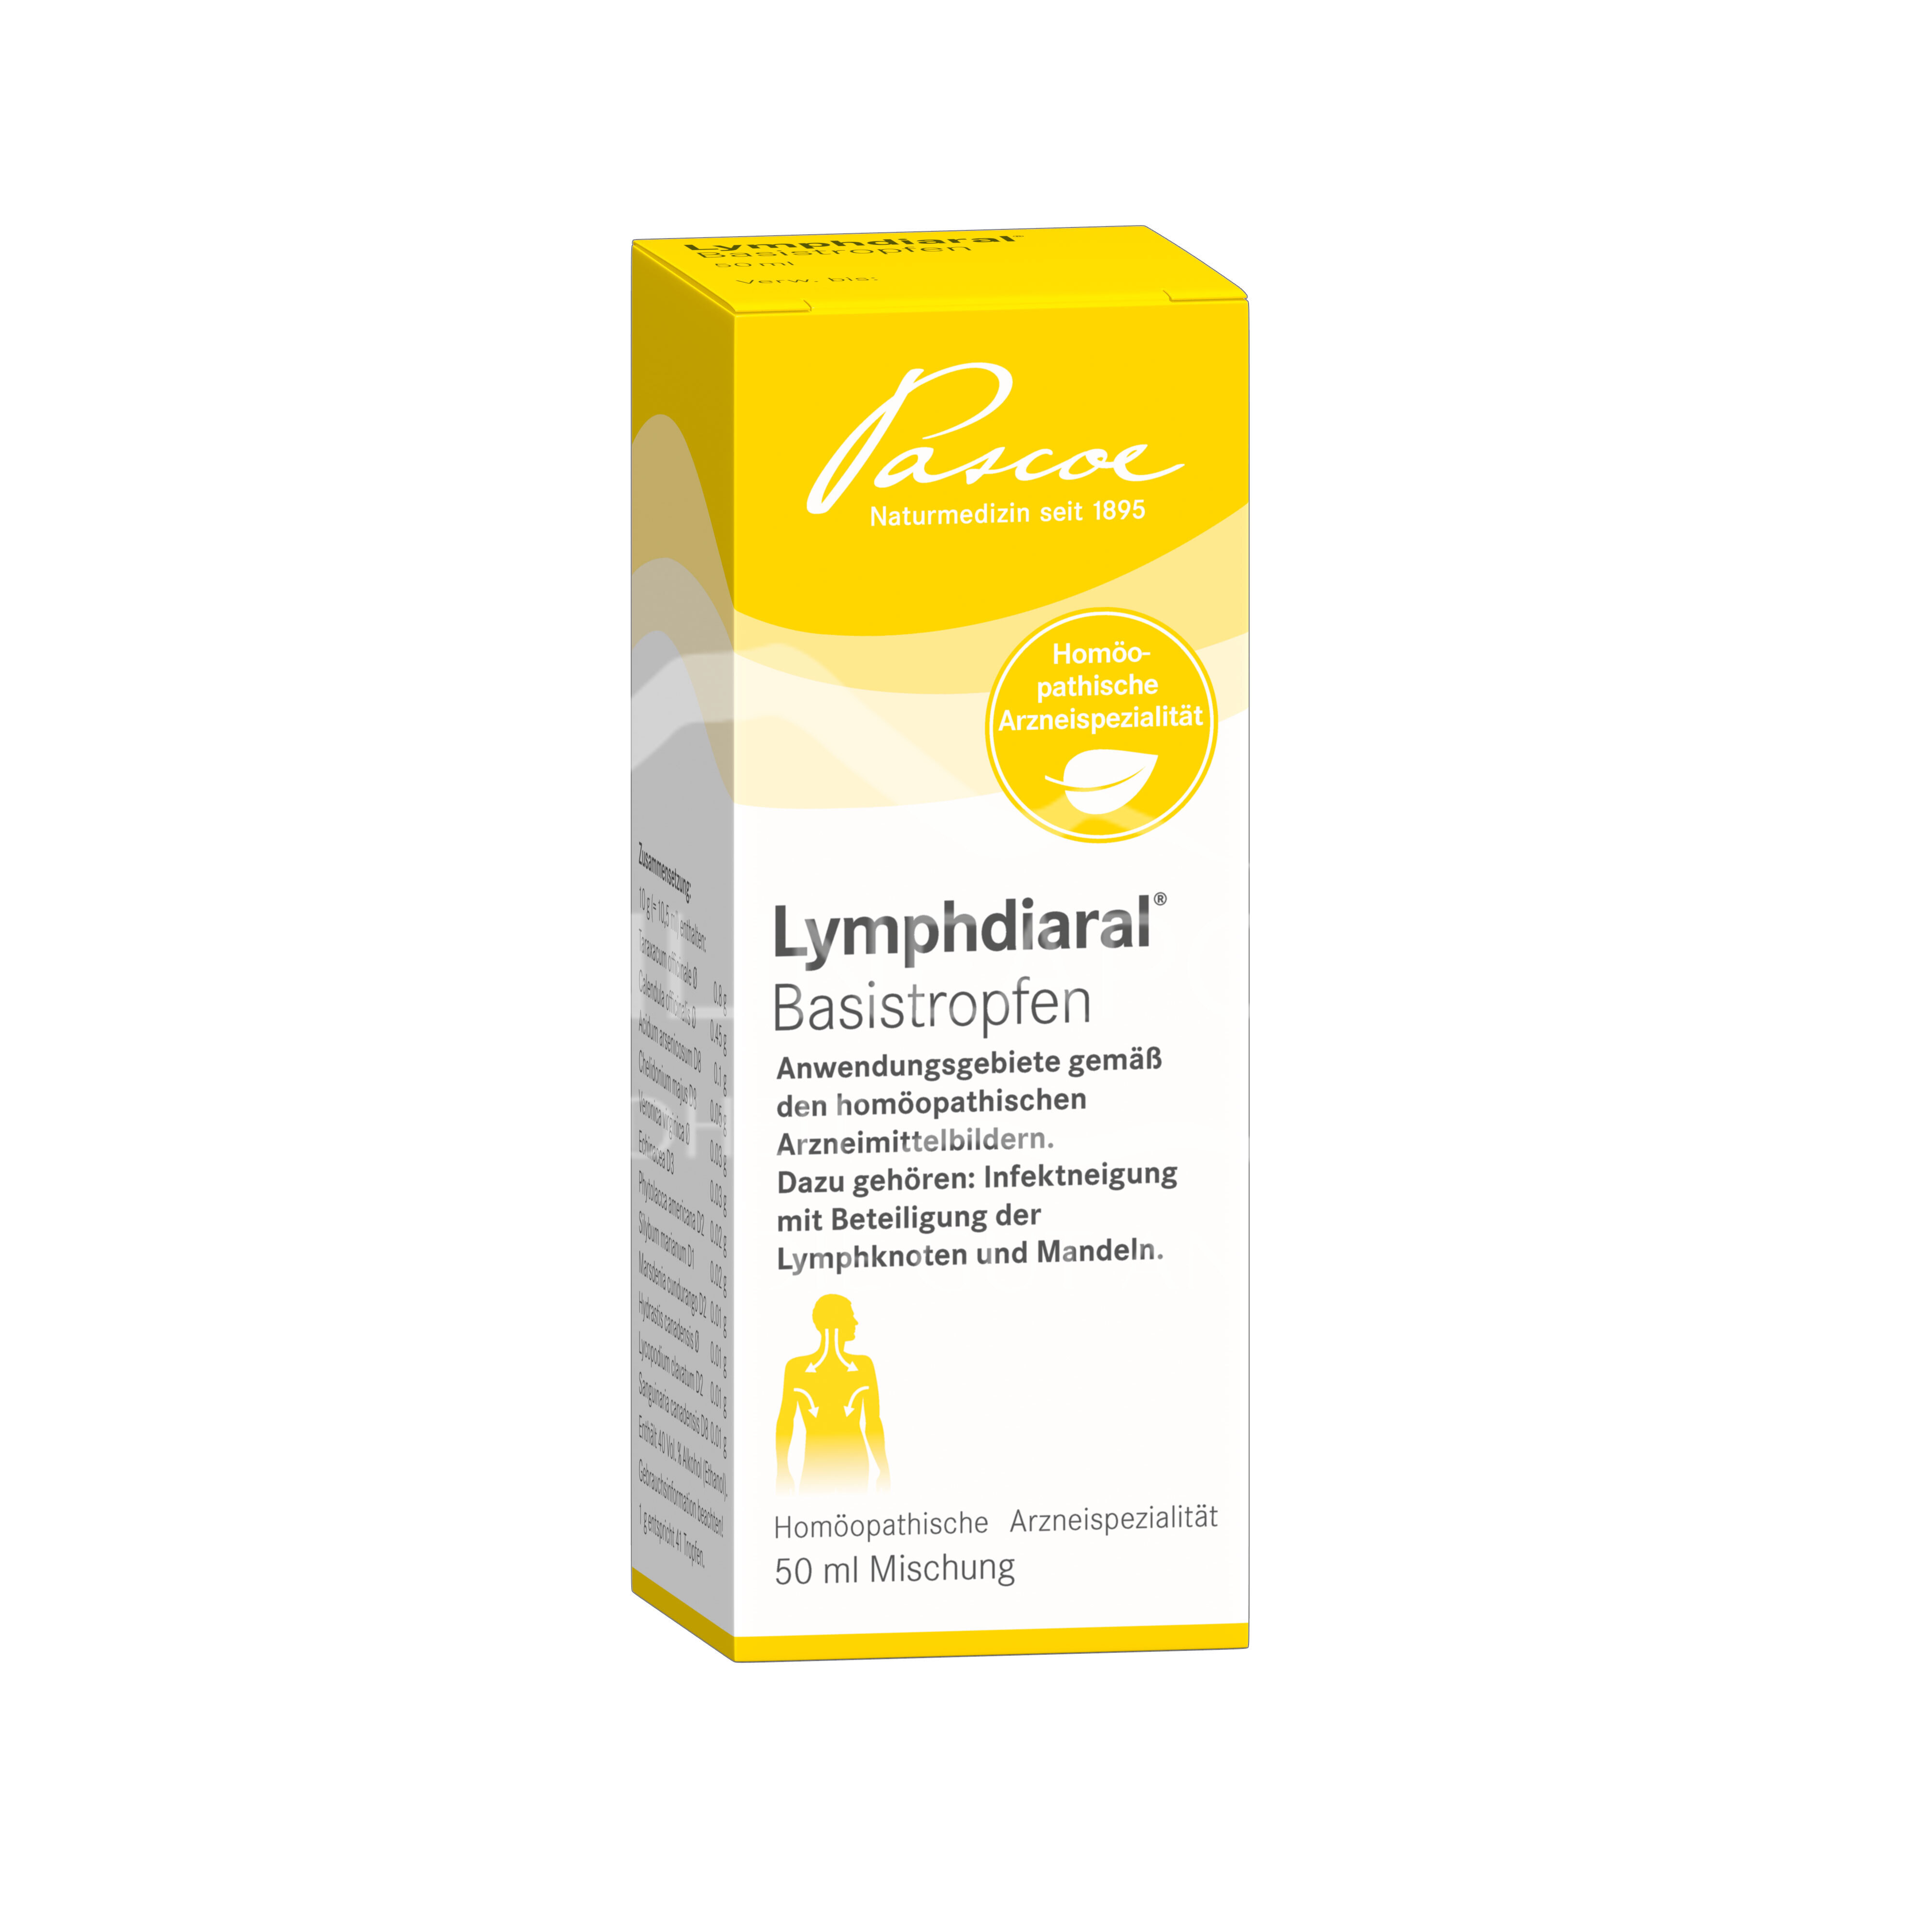 Lymphdiaral Basistropfen